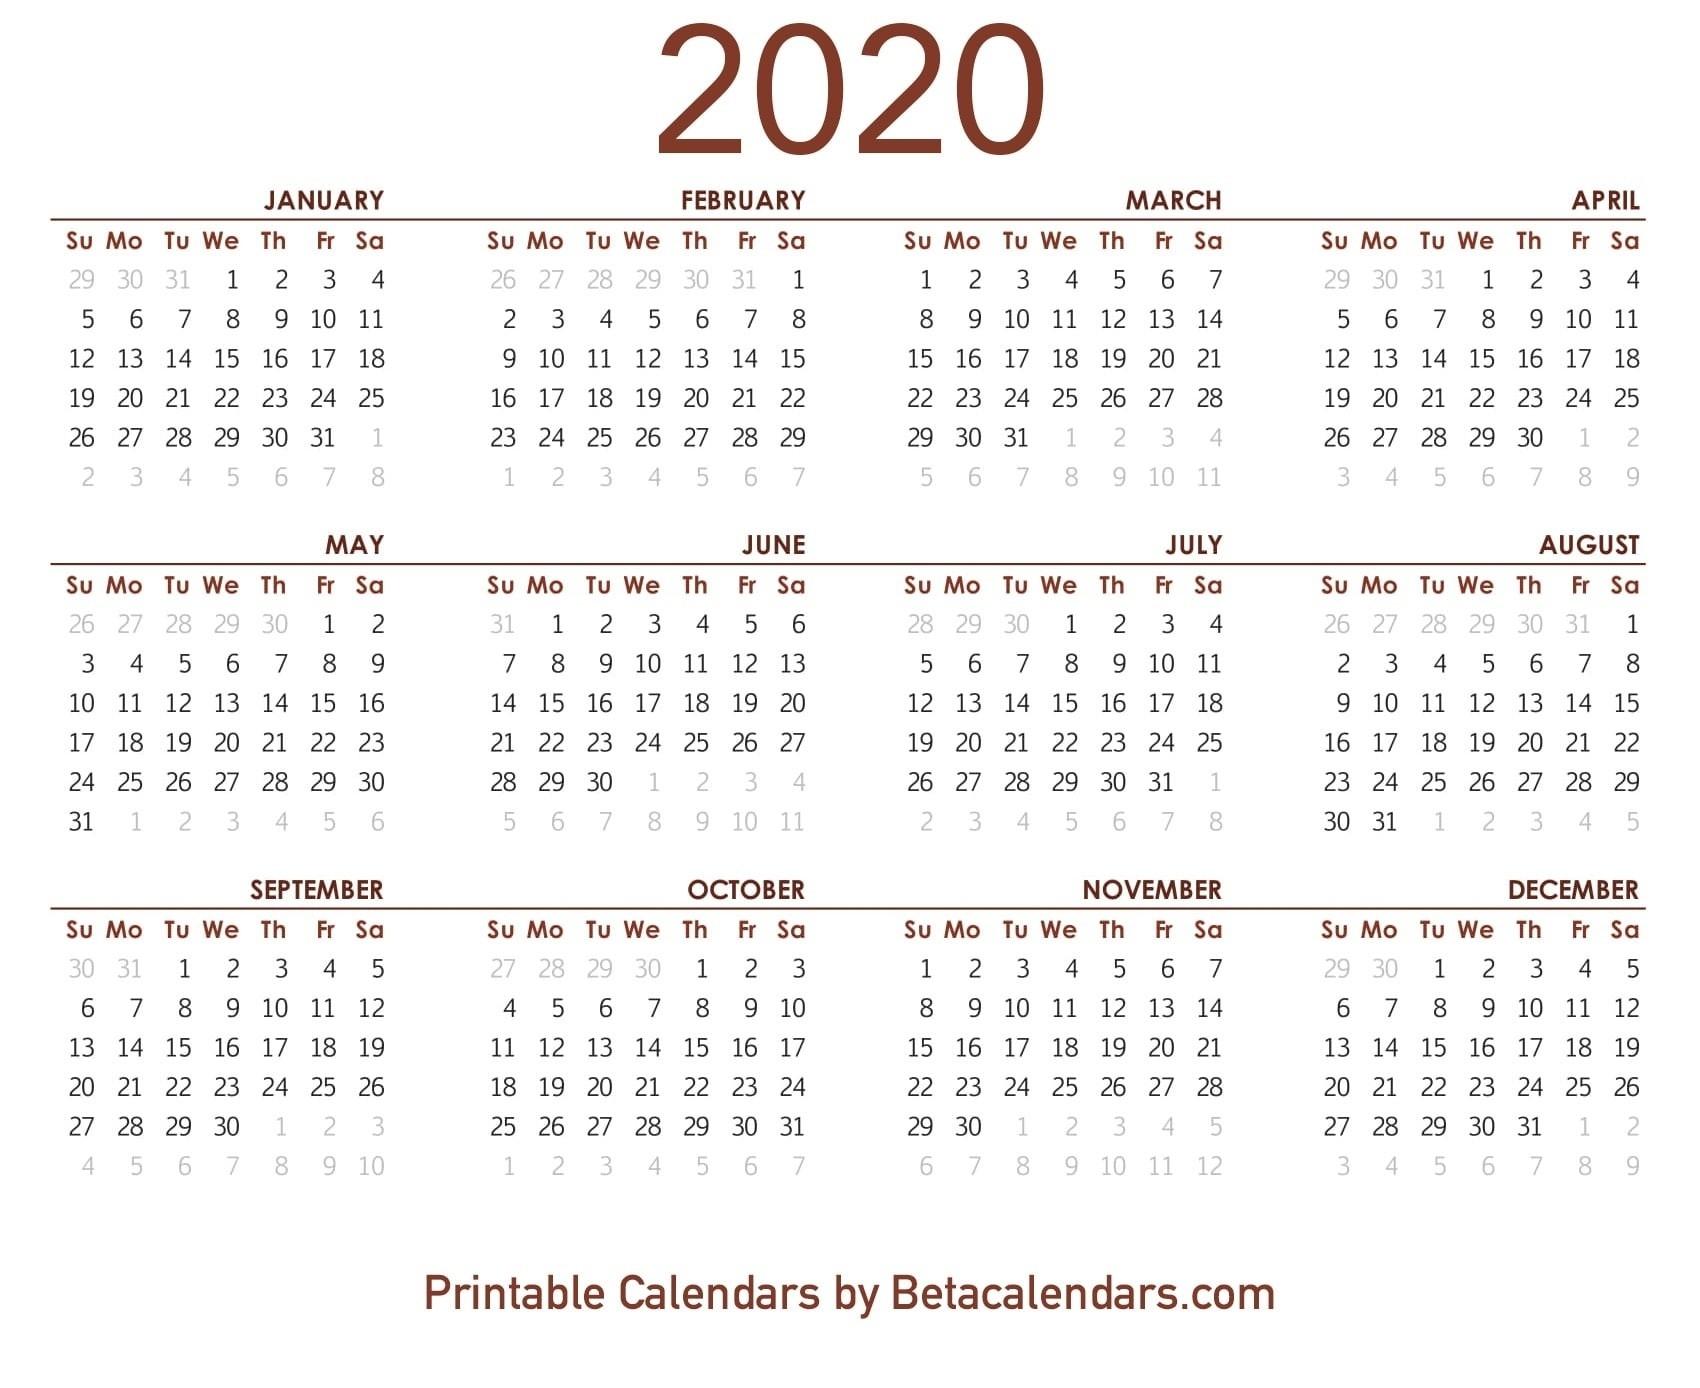 Printable 2020 Lunar Calendar | Monthly Printable Calender  2020 Solar Calendar Vs Lunar Calendar